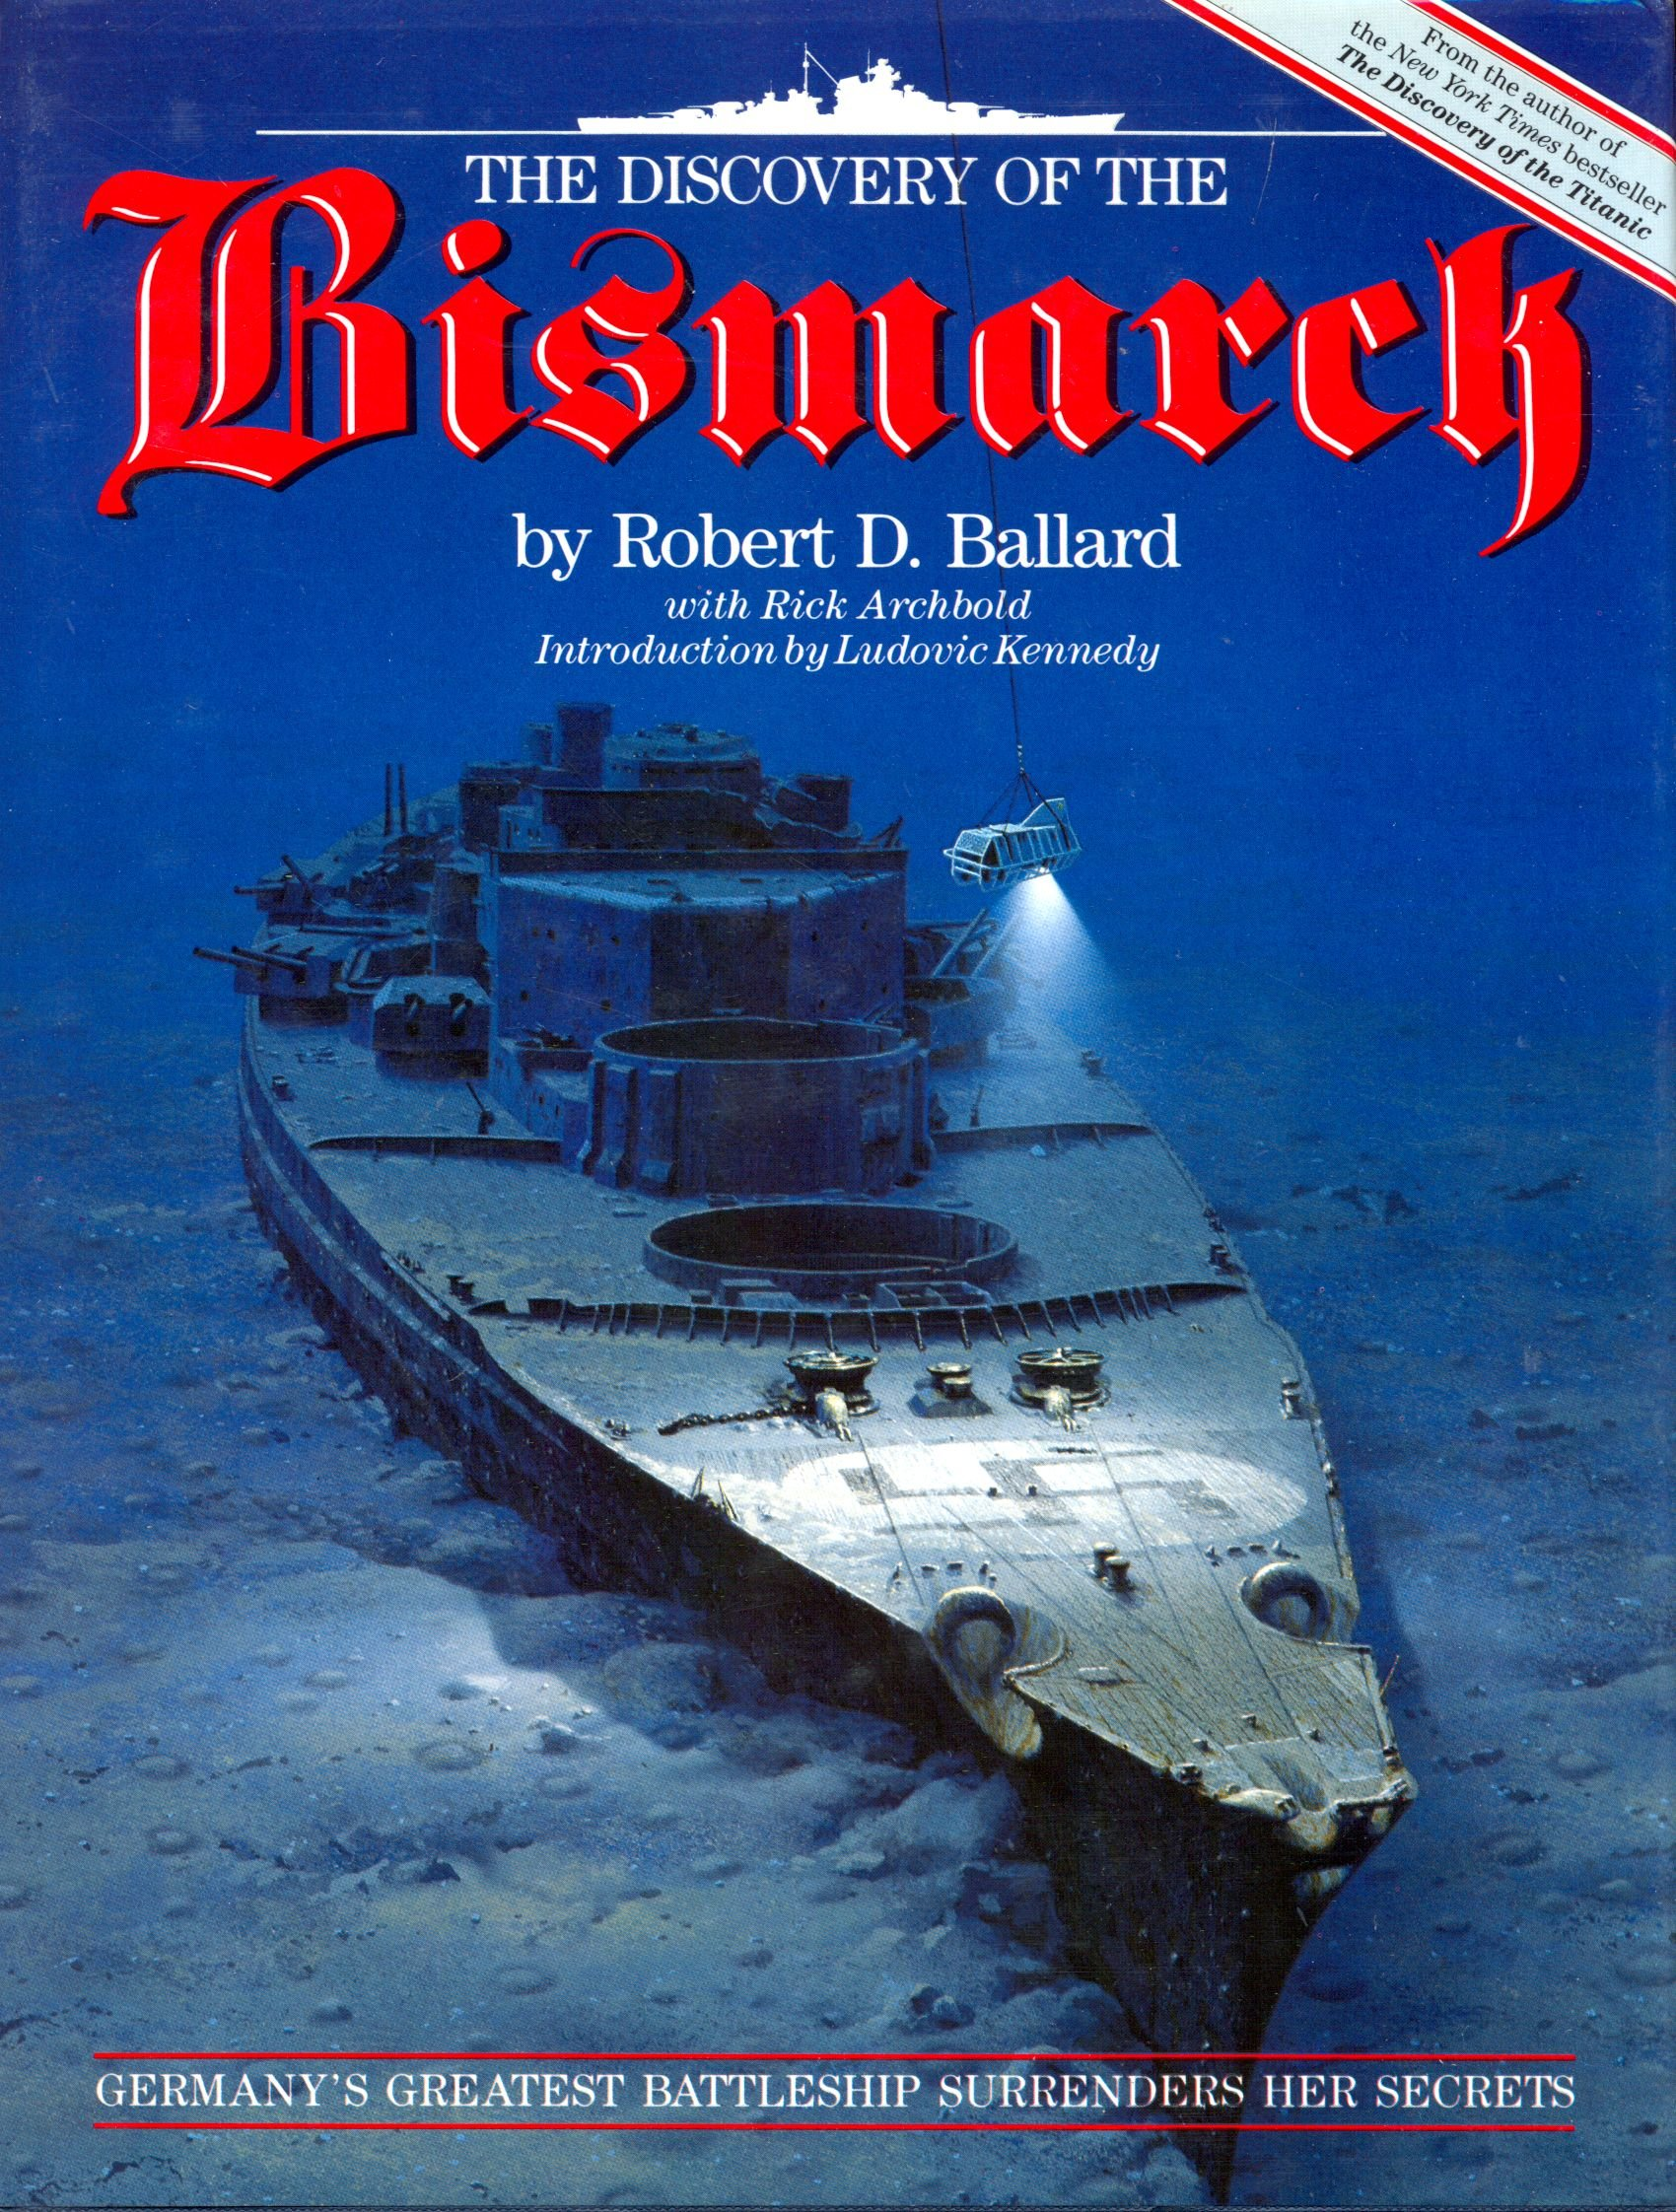 The Discovery of the Bismarck: Germany's Greatest Battleship Surrenders Her Secrets, Robert D. Ballard; Rick Archbold